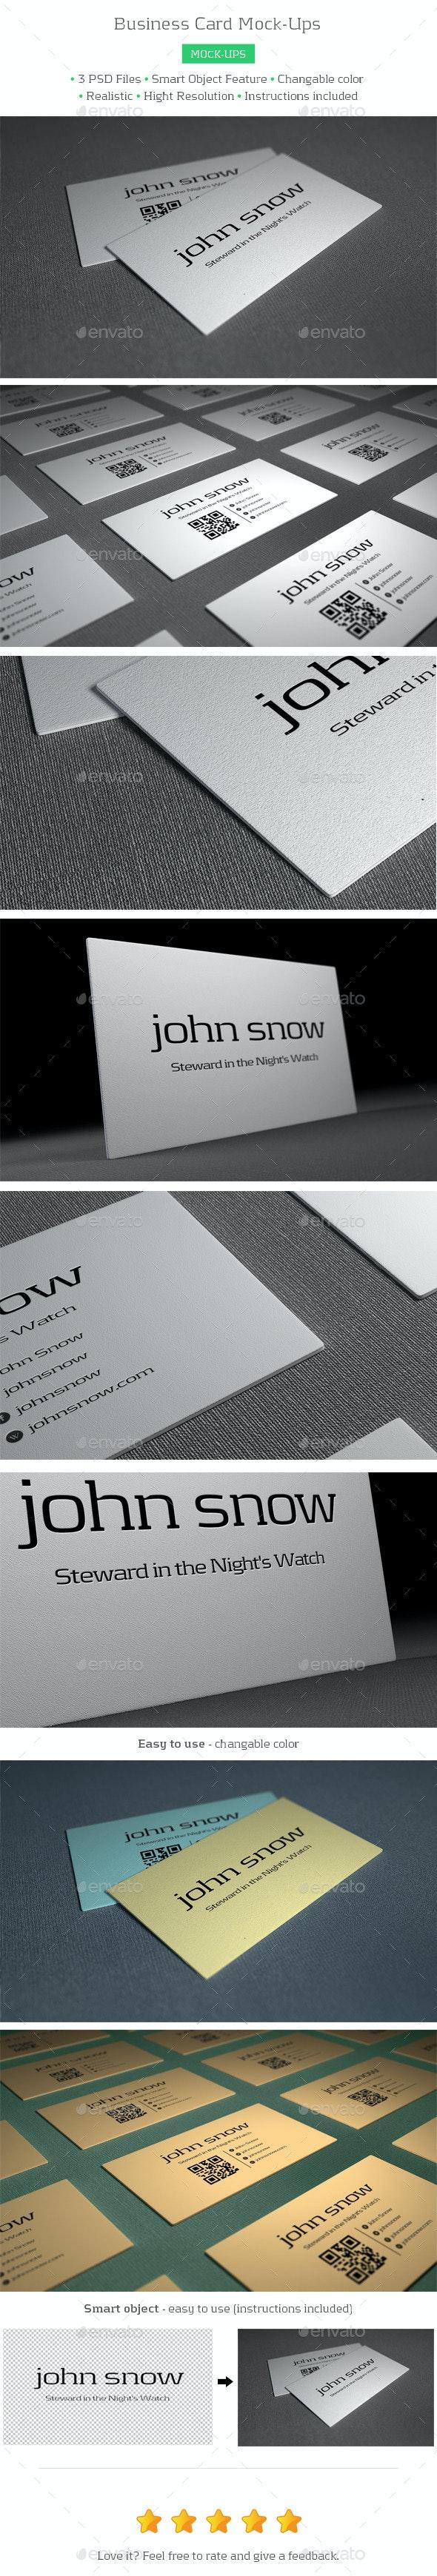 Business Card Mock-Ups - Business Cards Print